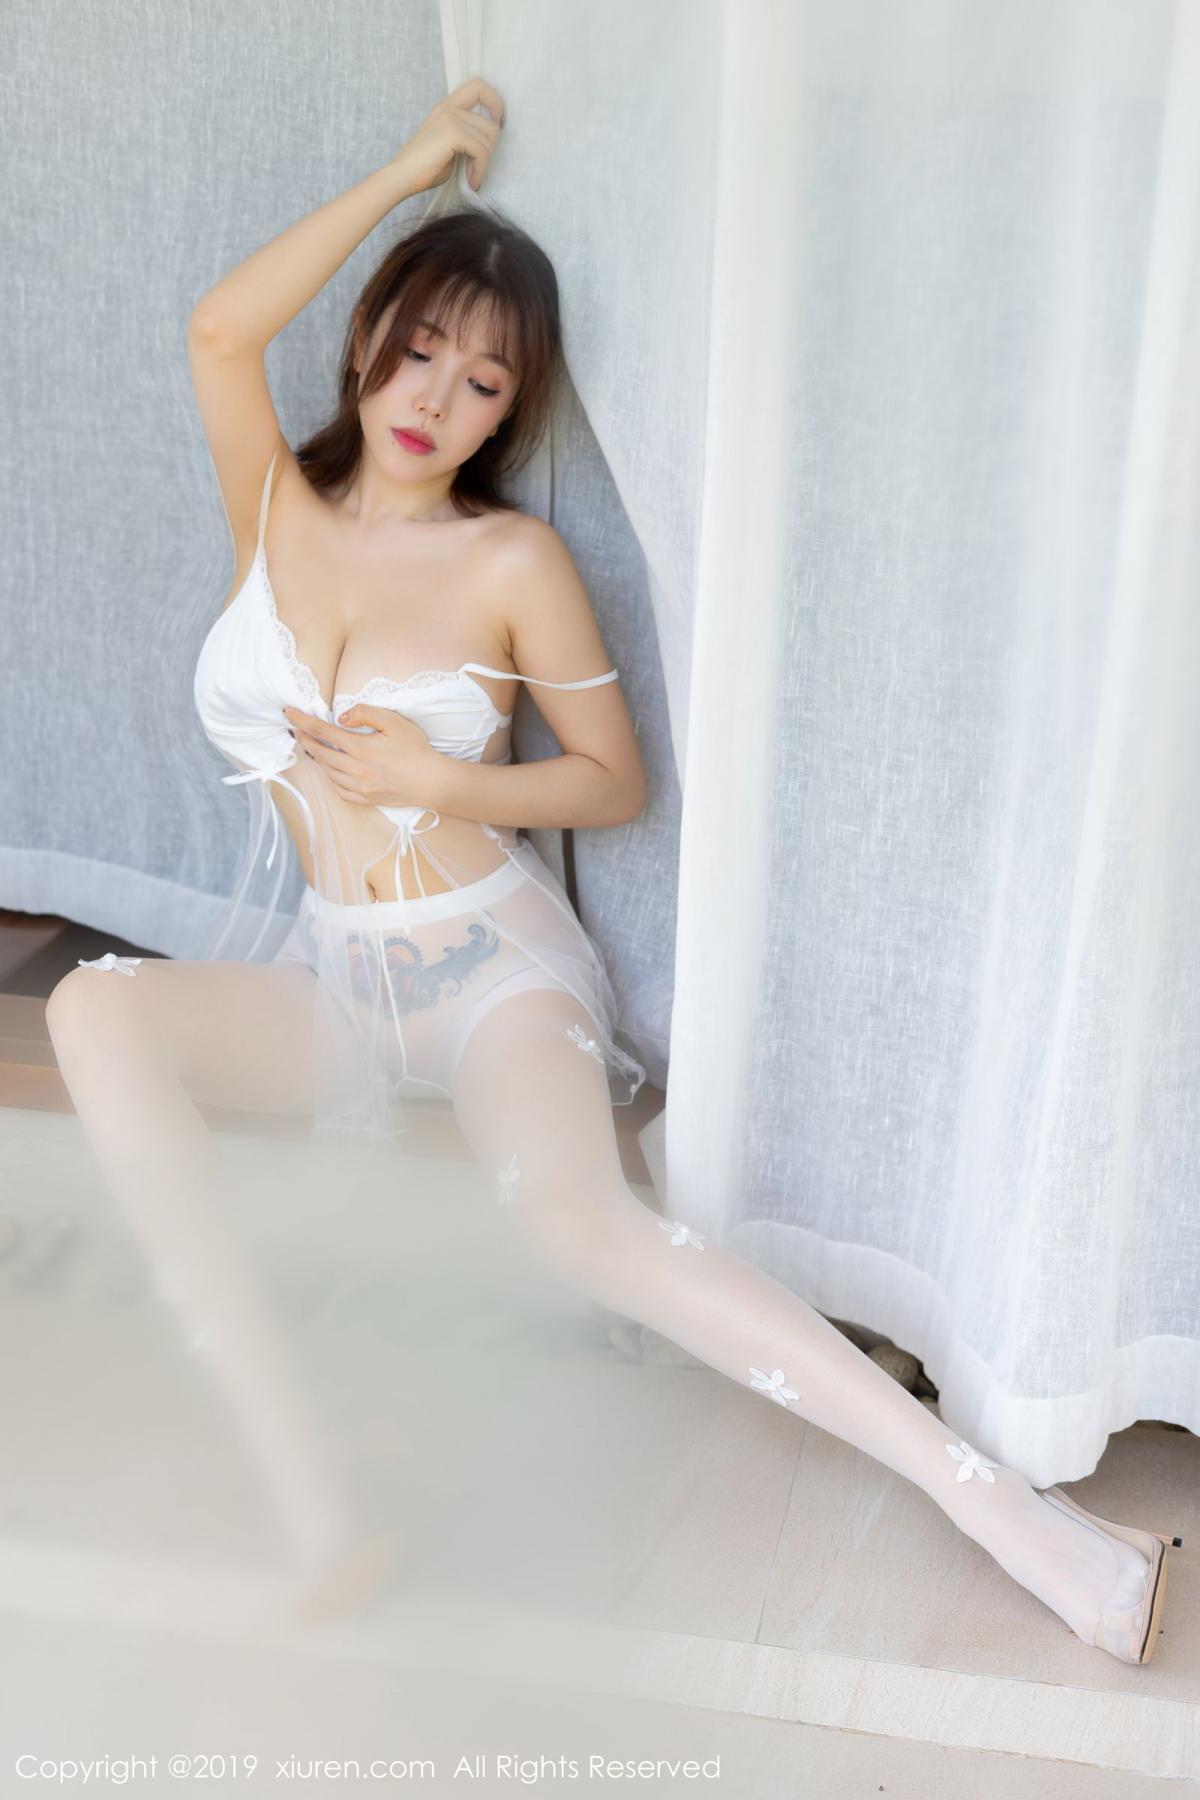 [XiuRen] Vol.1578 Huang Le Ran 24P, Huang Le Ran, Underwear, Xiuren